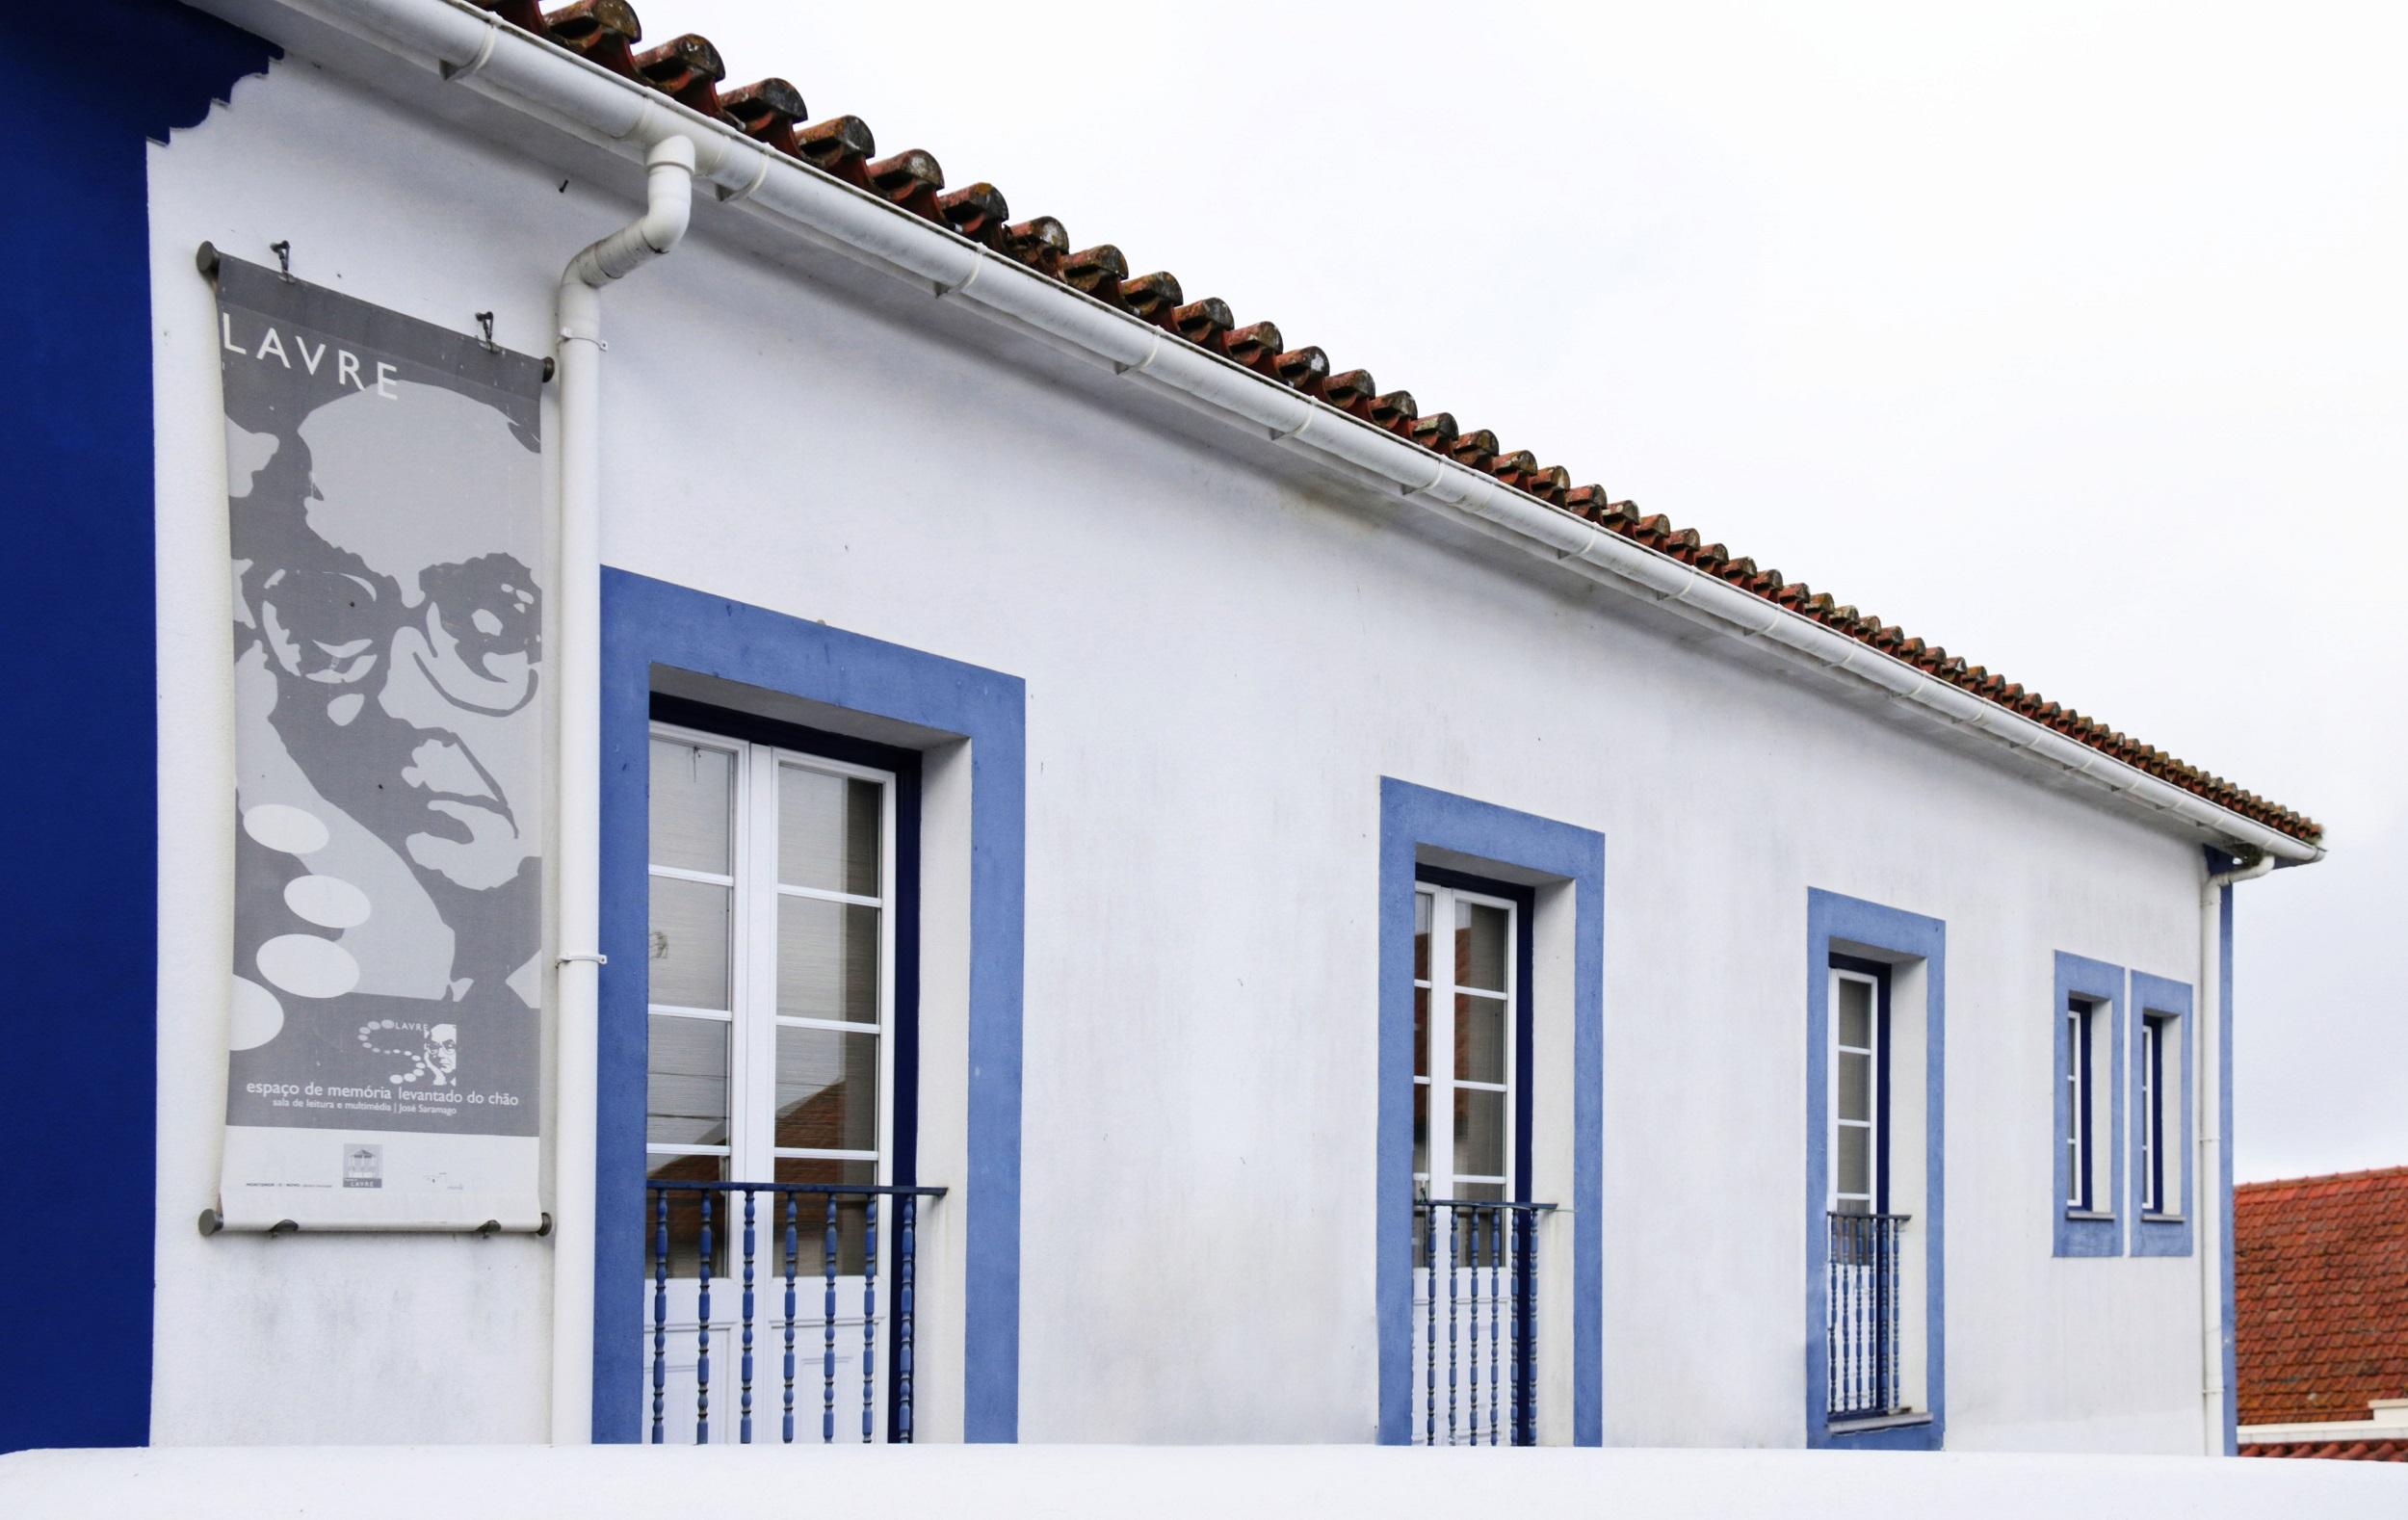 Casa de Leitura José Saramago (CMMN, 2019)